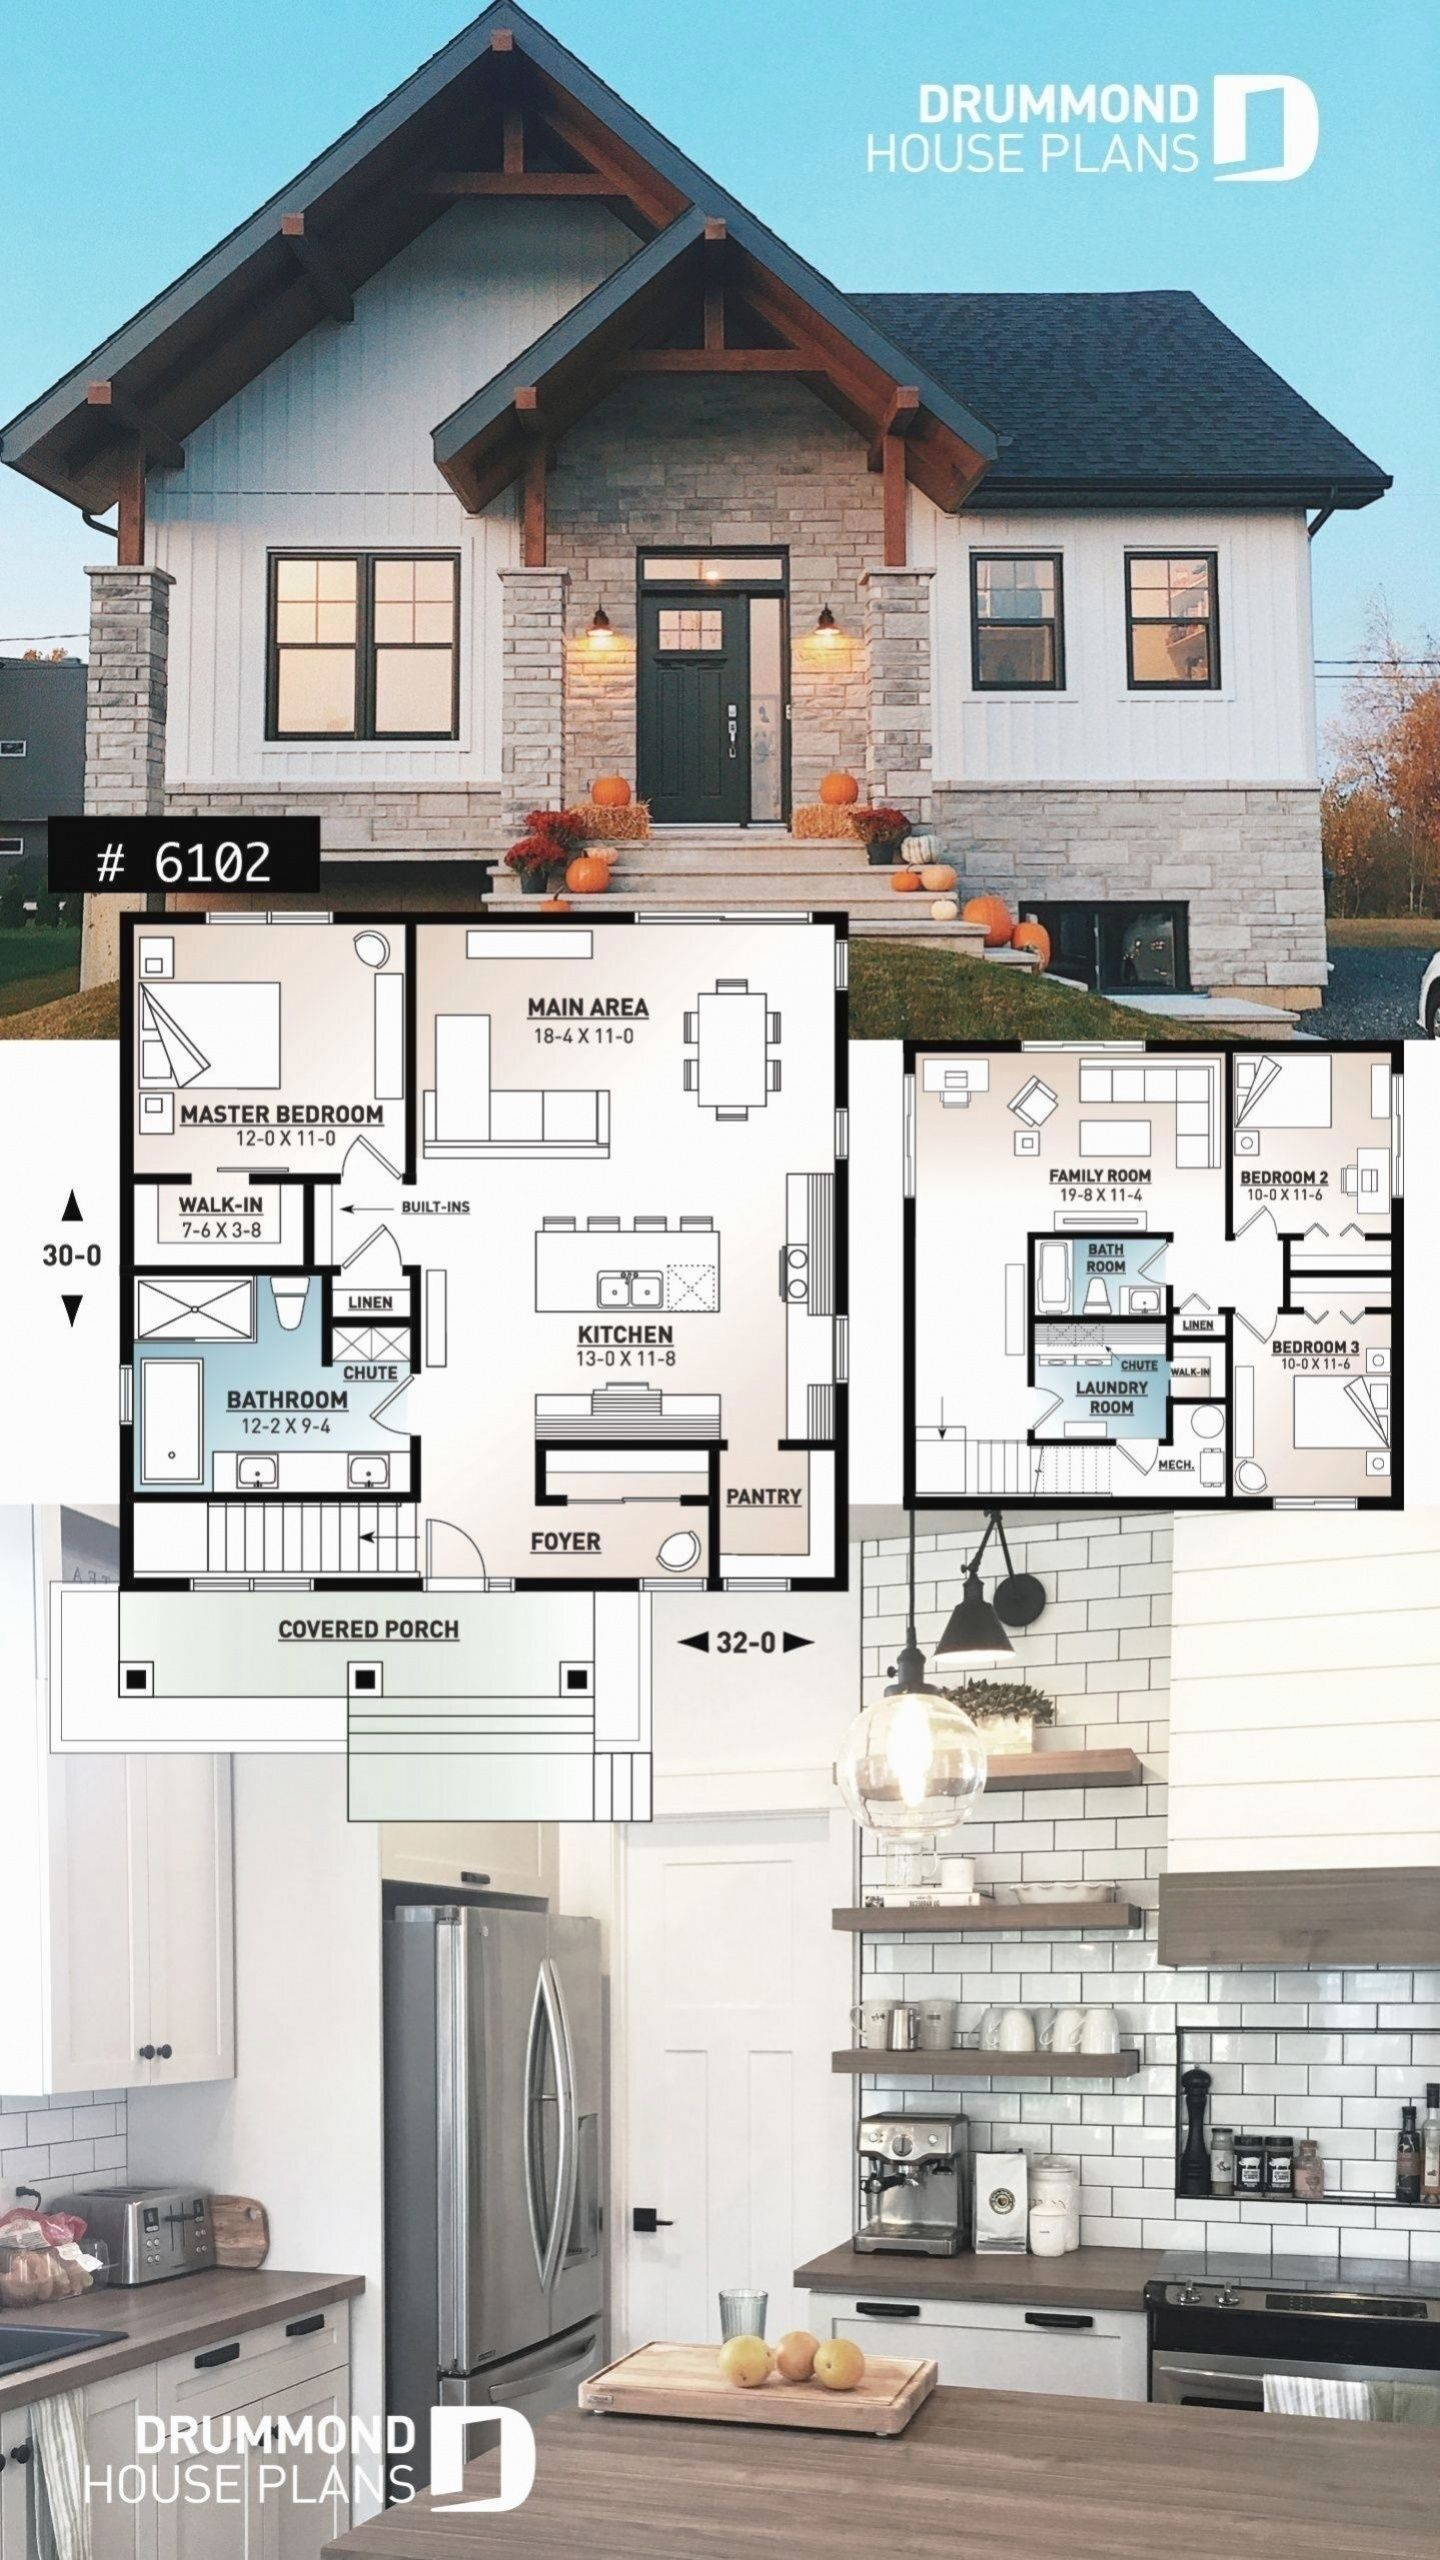 Ideal Modern Farmhouse Plan For Empty Nesters 2020 House Blueprints Ev Tasarim Planlari Ev Plani